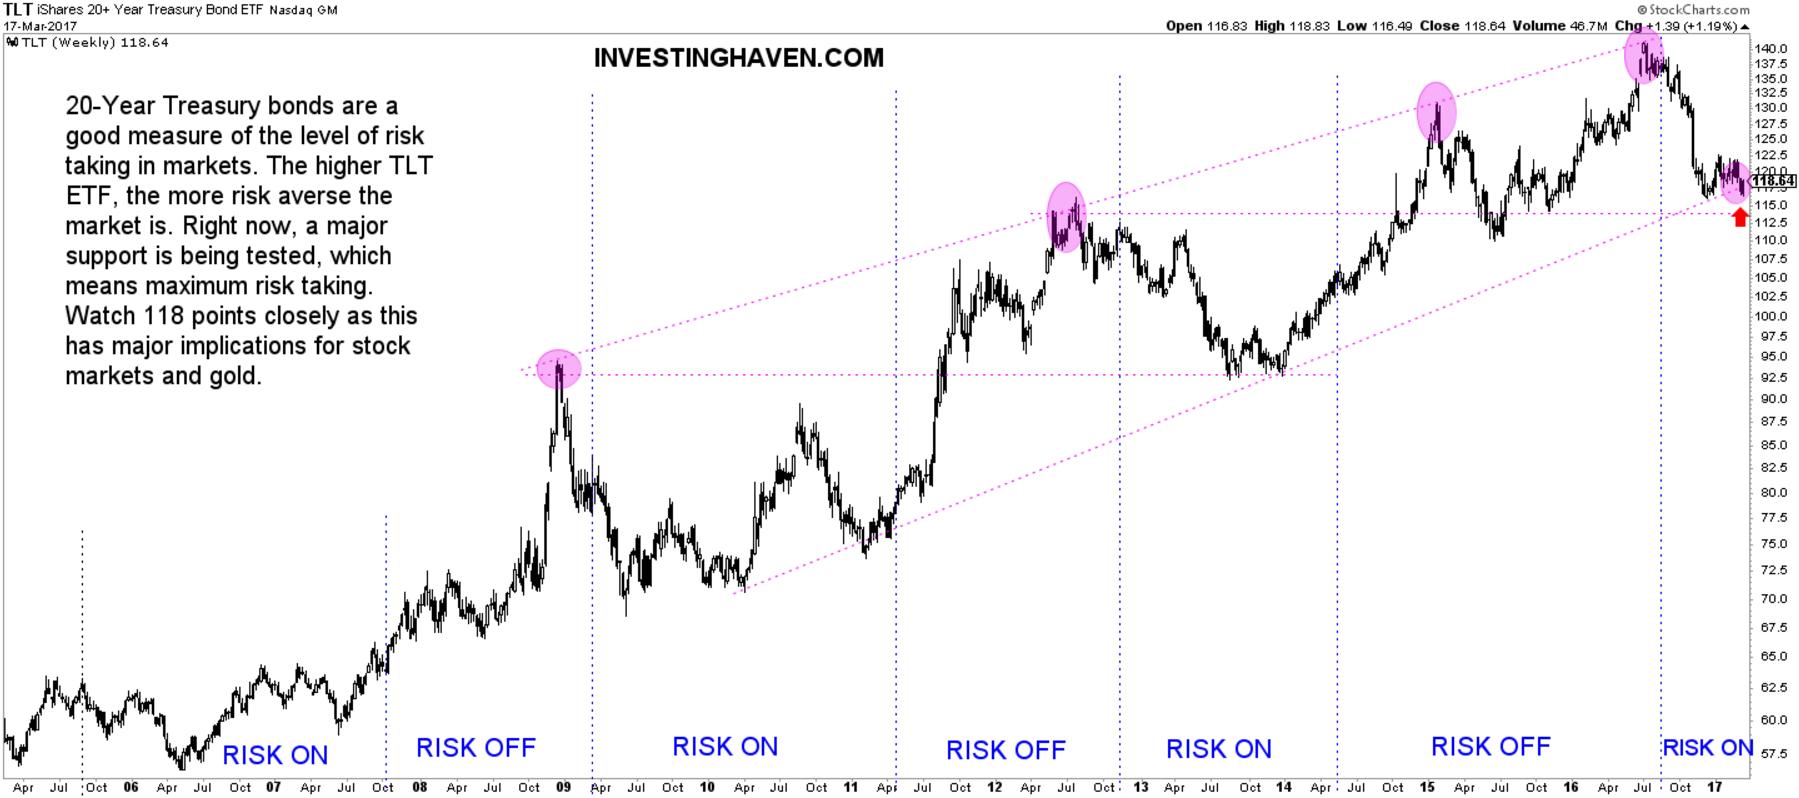 leading indicator risk